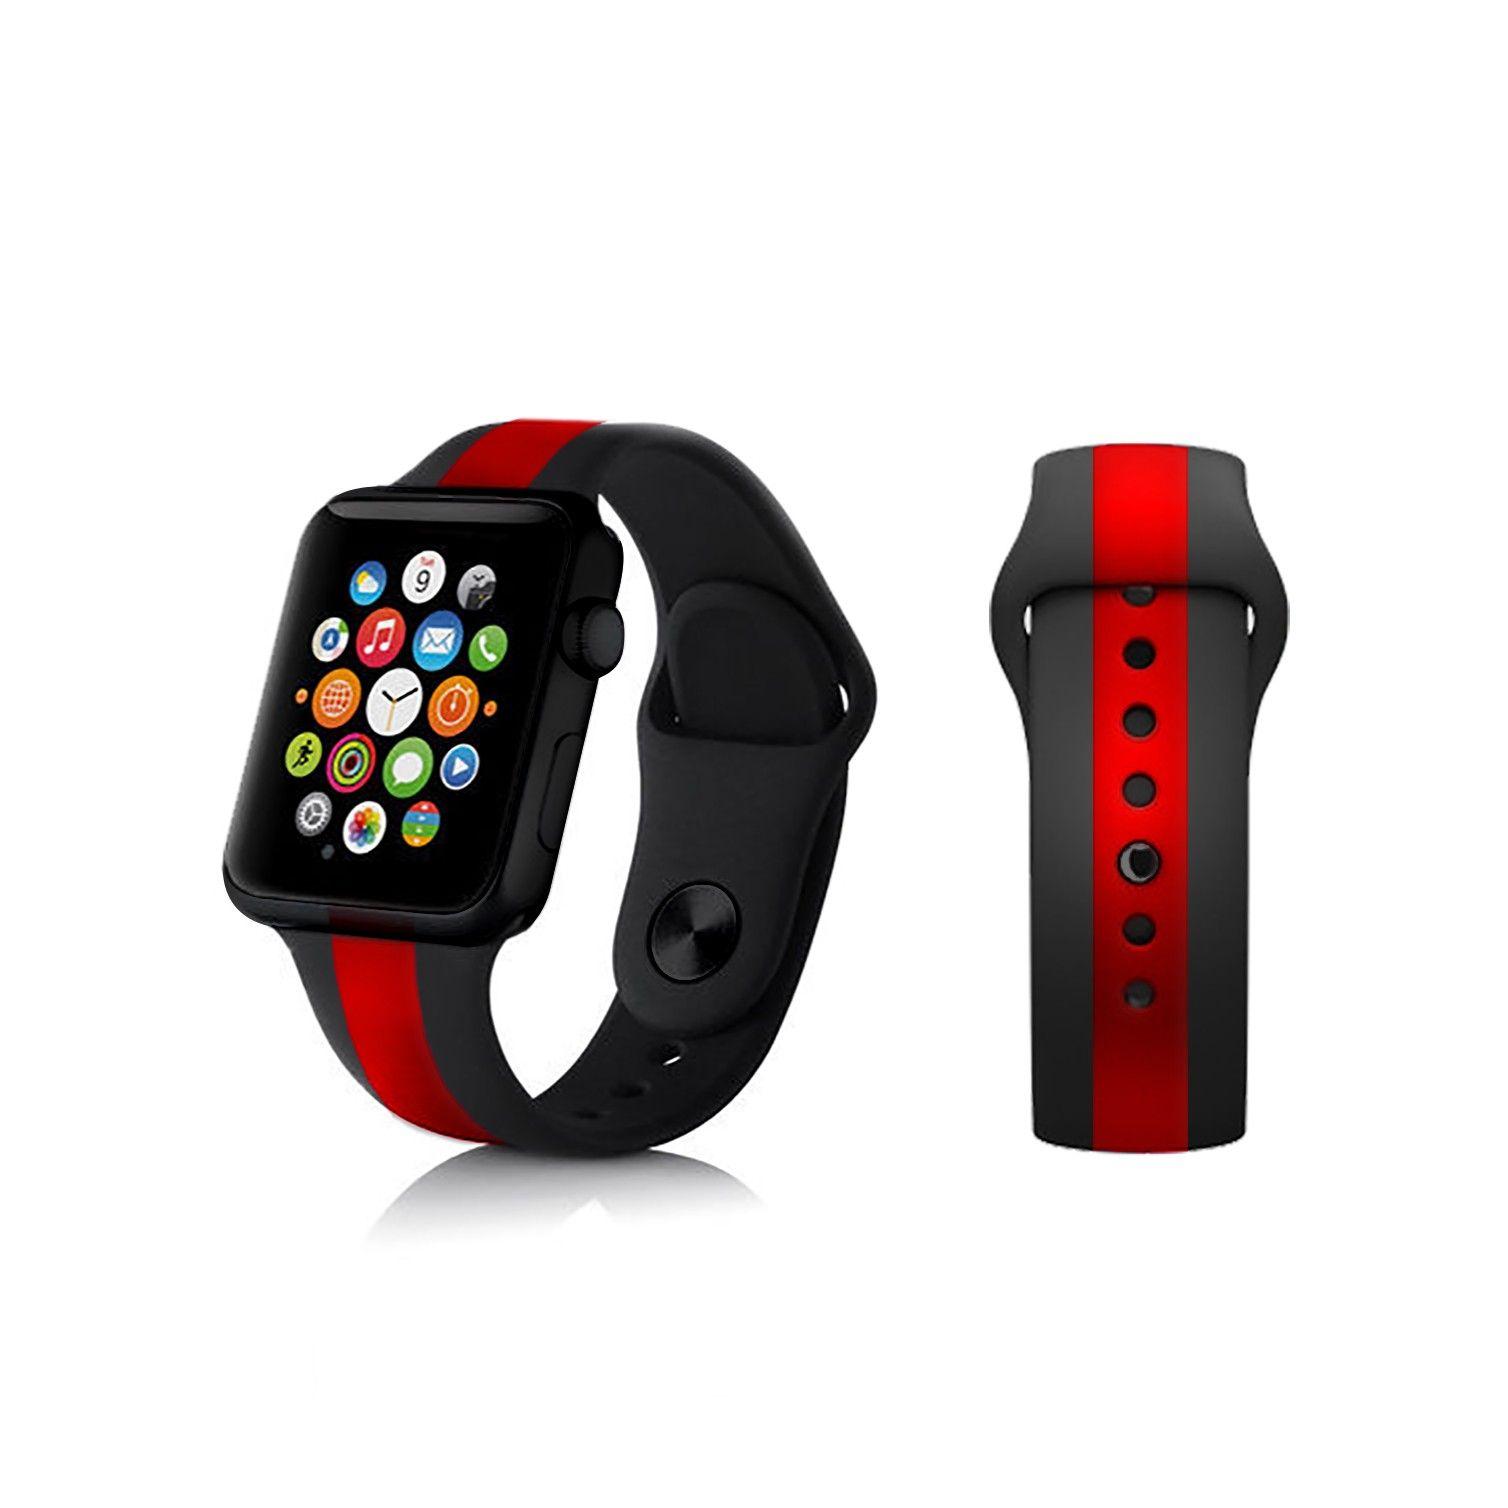 Imatter Trl Apple Watch Band Apple Watch Bands Watch Bands Apple Watch